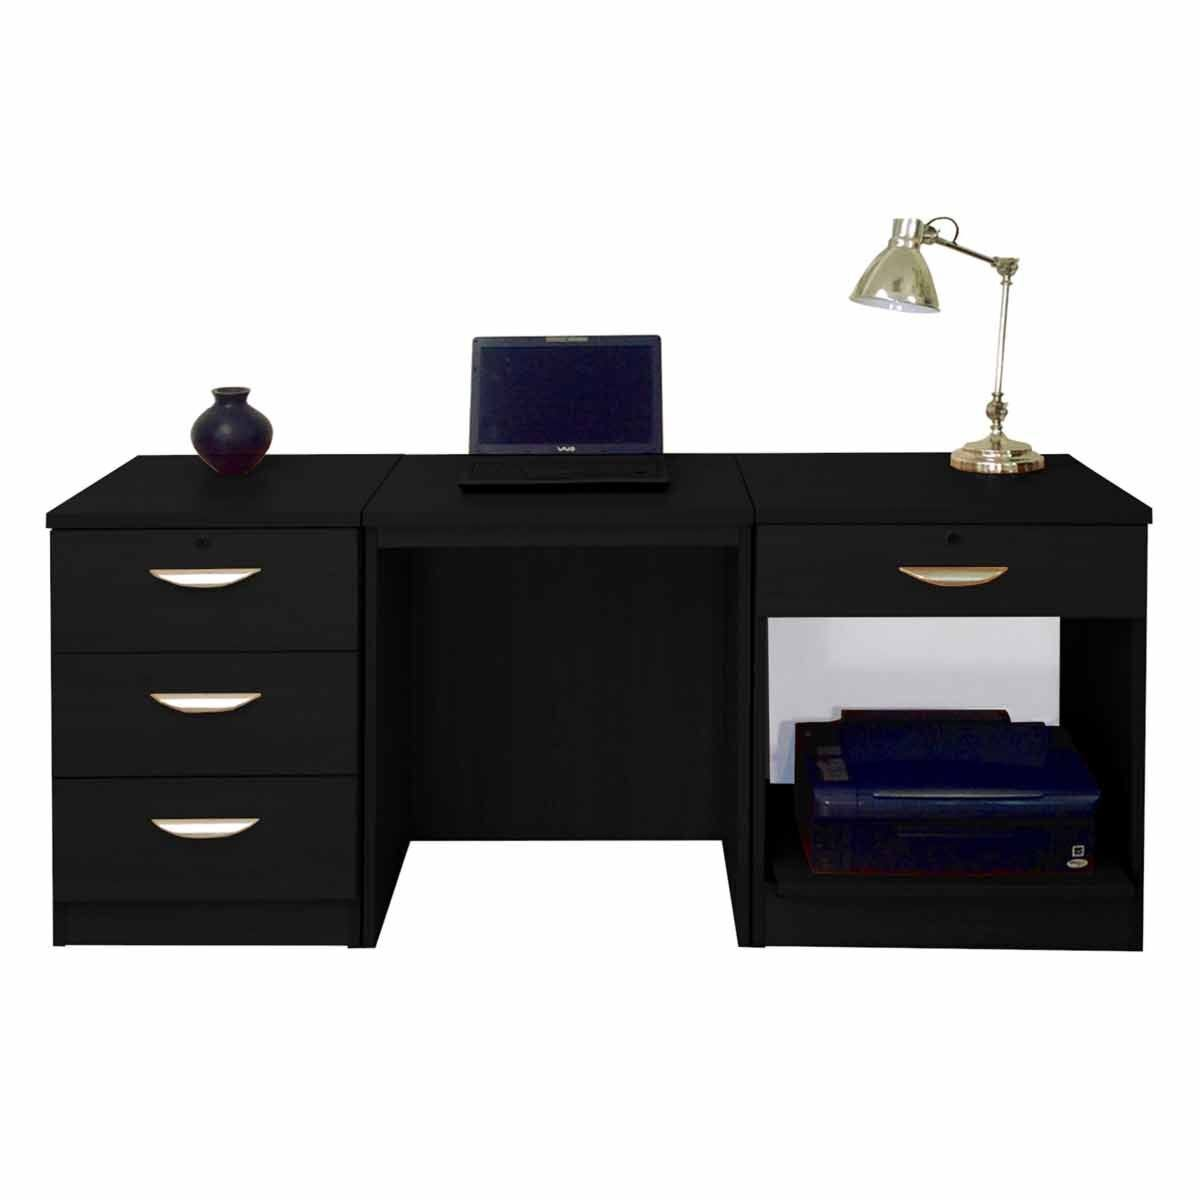 R White Home Office Furniture Desk Set Black Havana